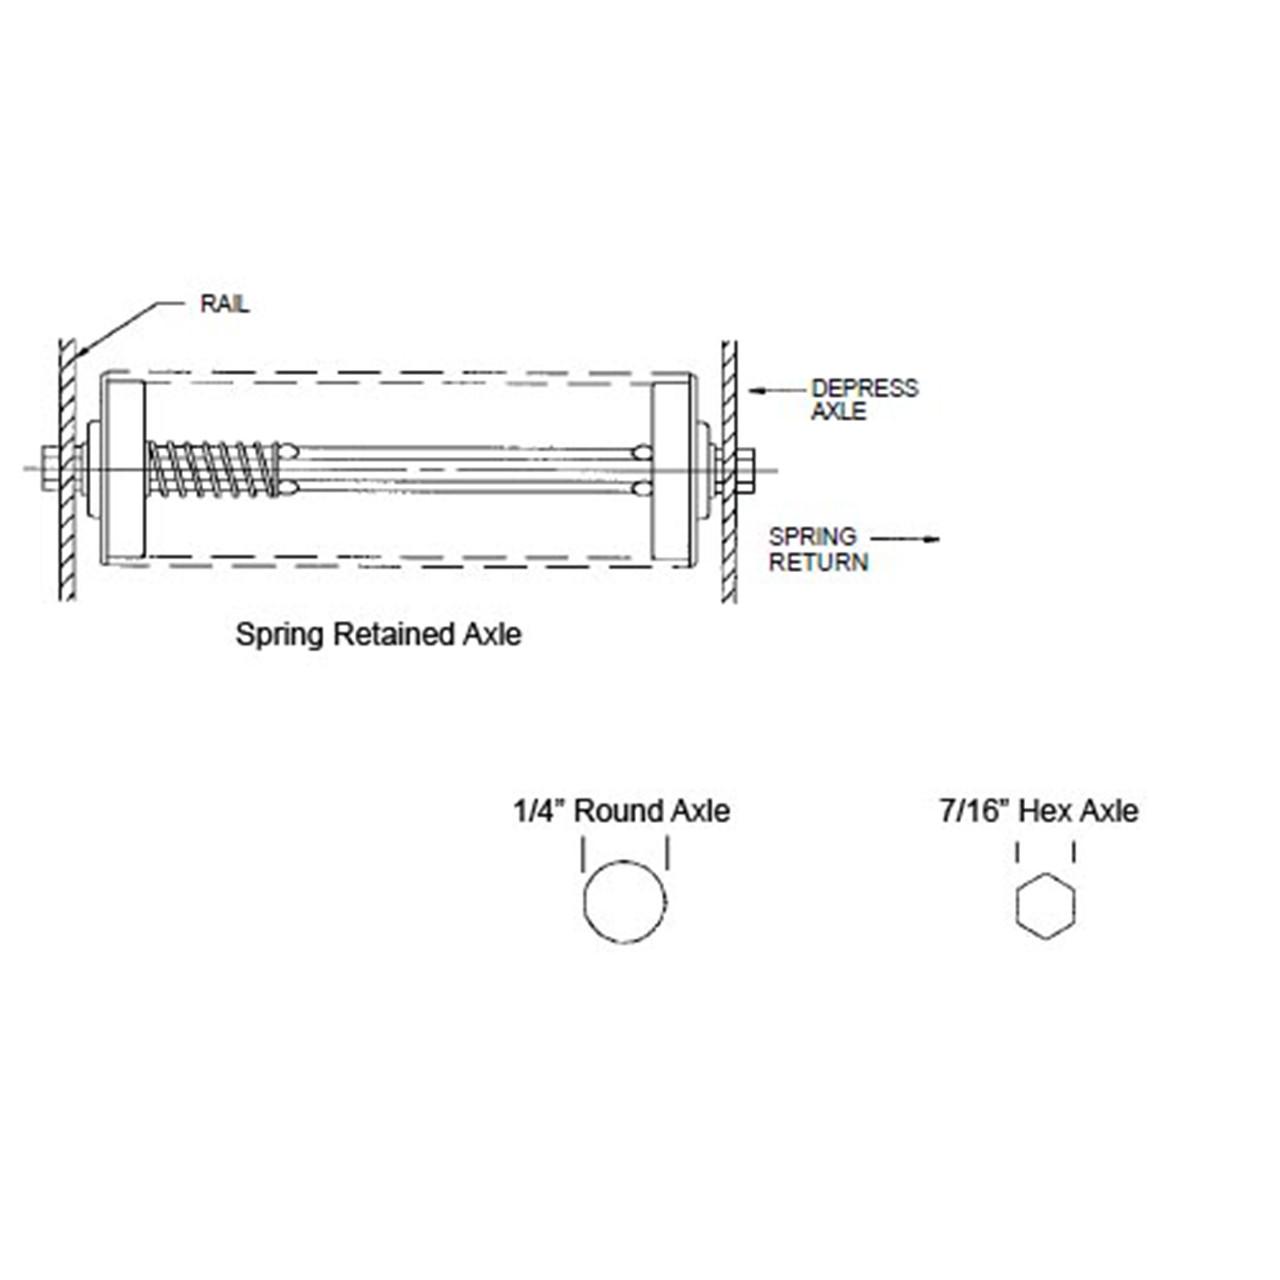 Replacement Conveyor Roller Specifications